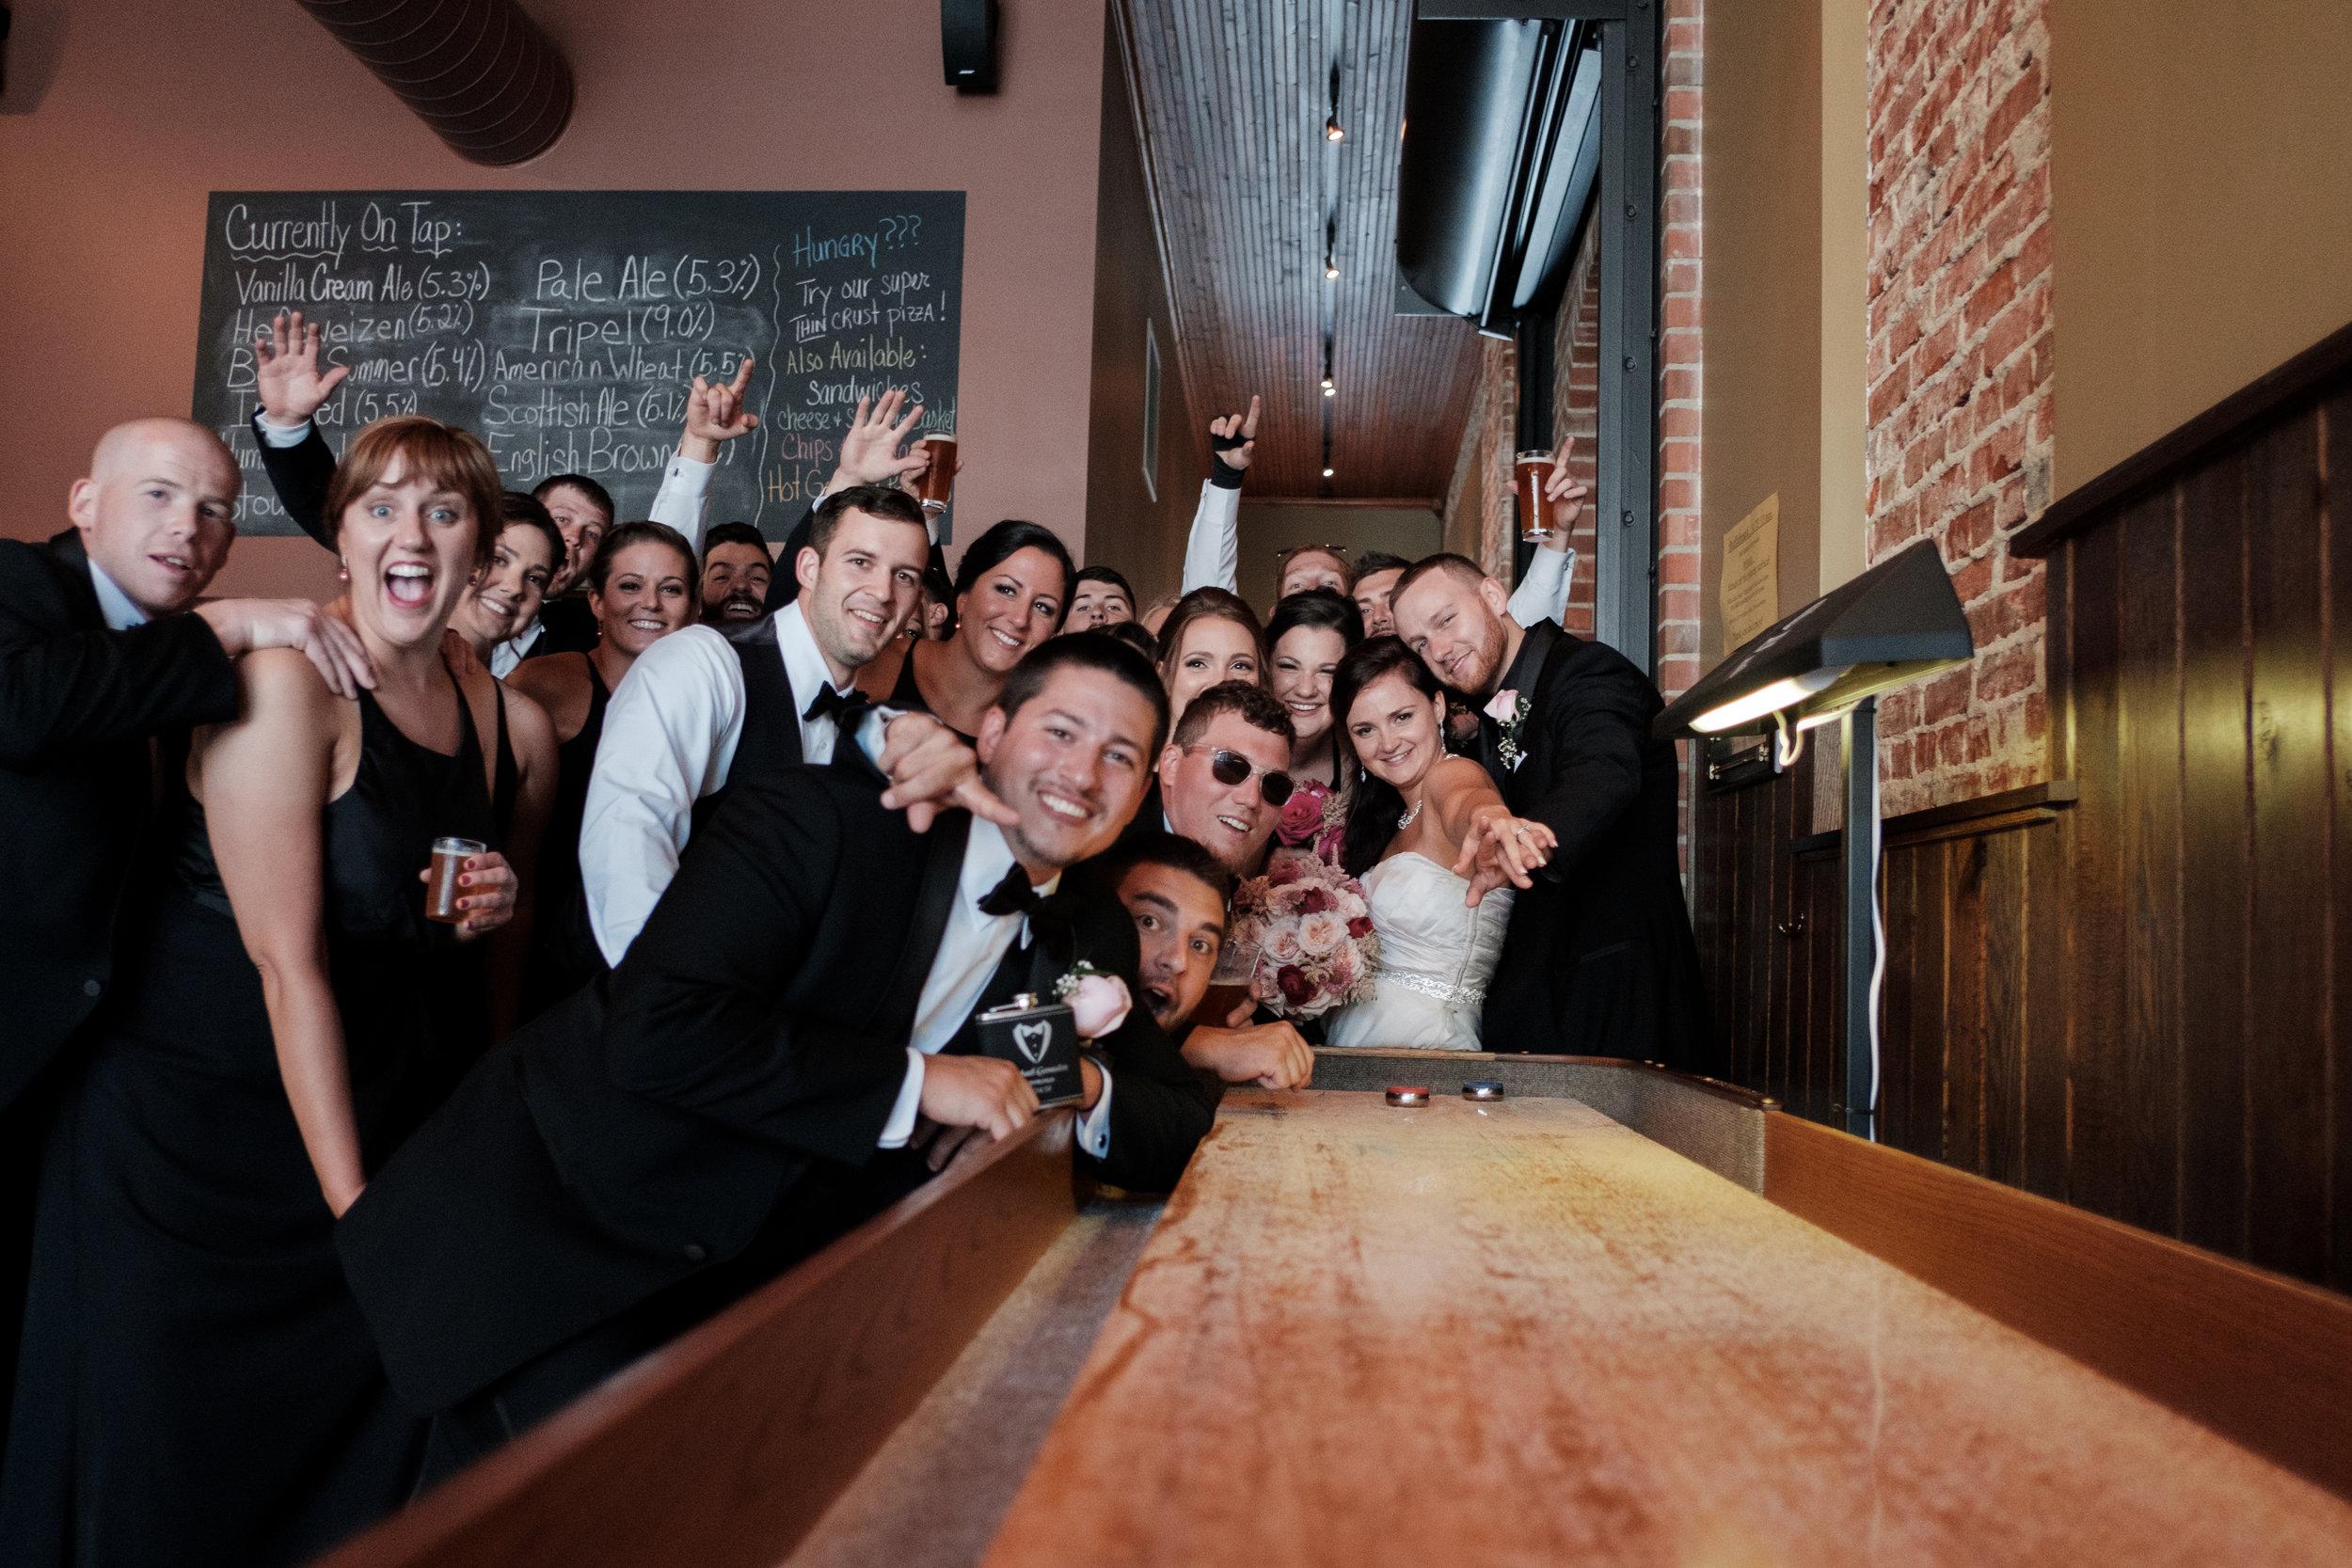 2018 BAP ChelseaJarred StBernadette Rockford Wedding-330.jpg